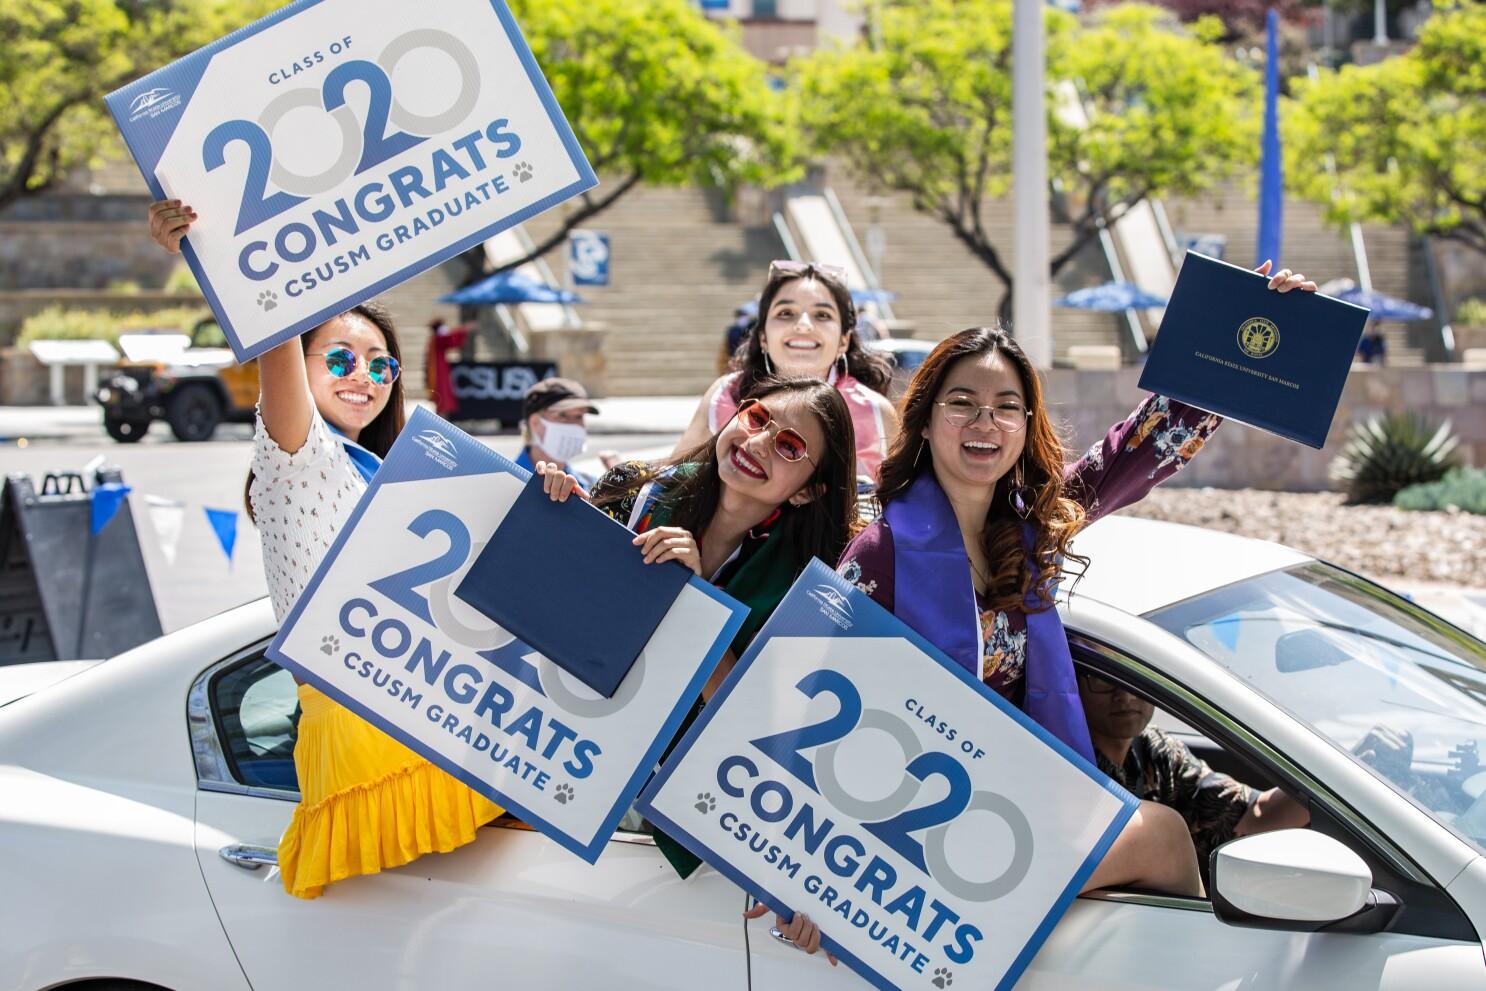 CSUSM 2020 Graduation